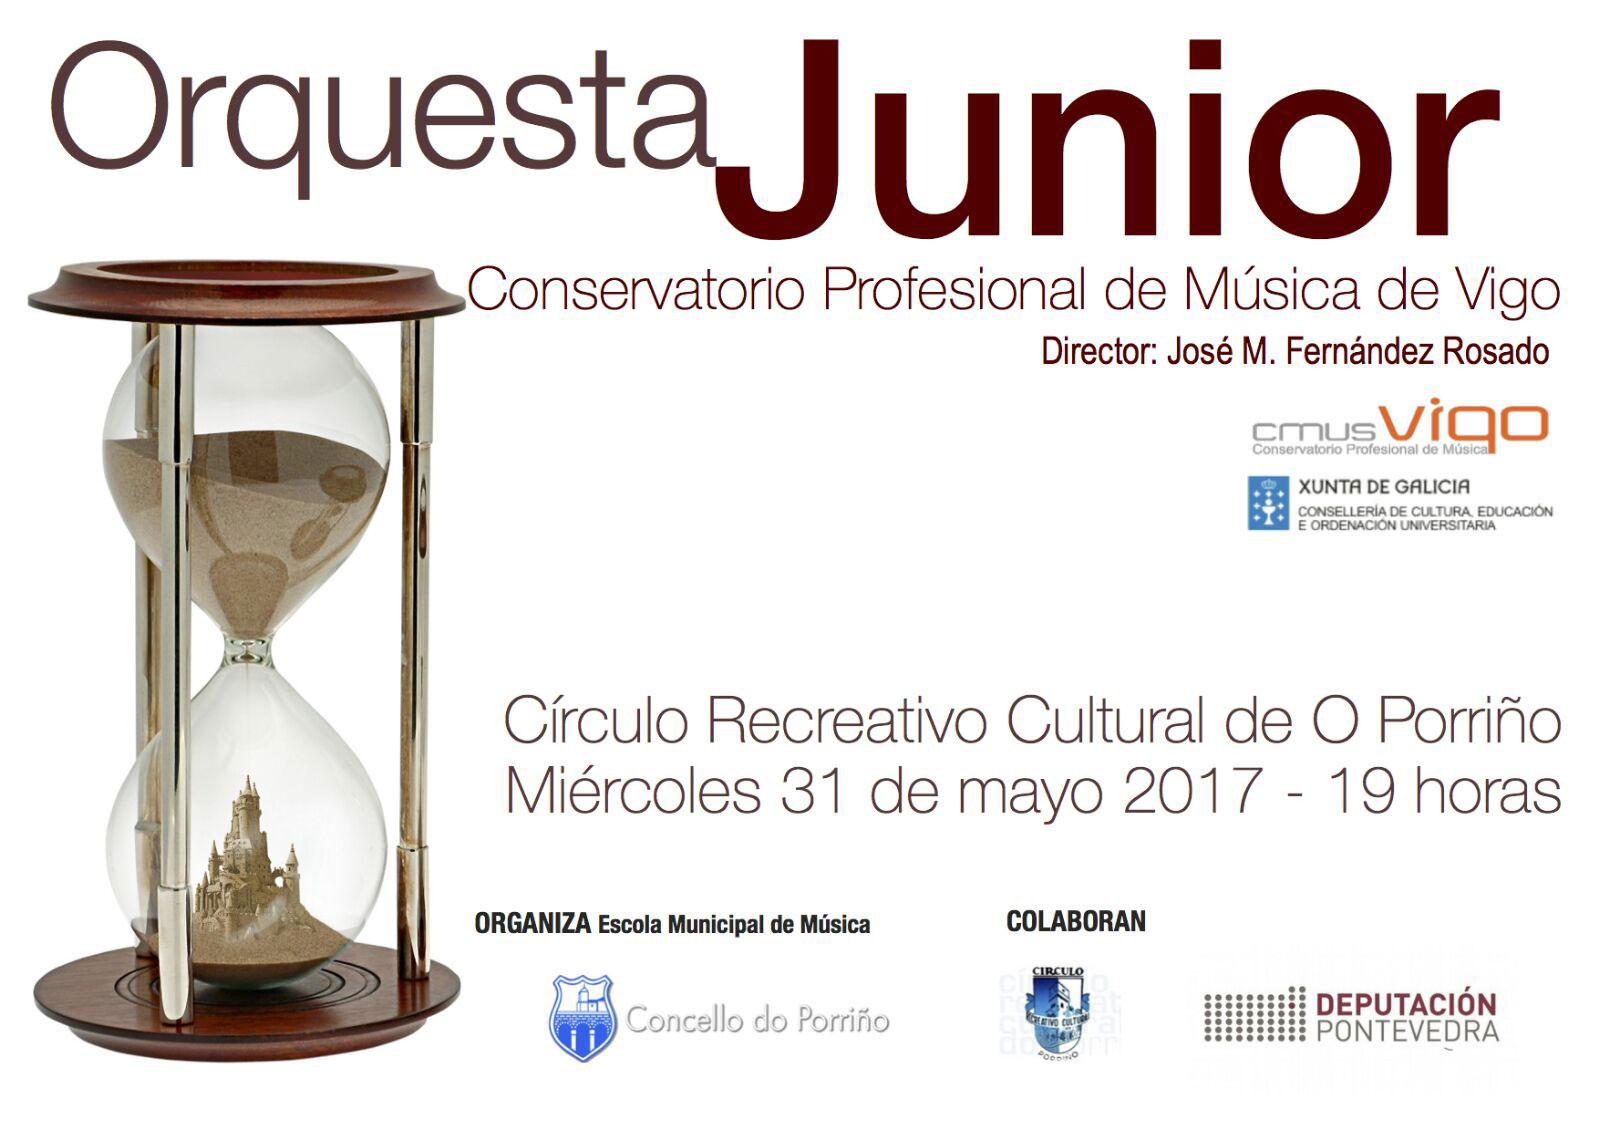 Orquesta-Junior-CMUS-Vigo-Porriño